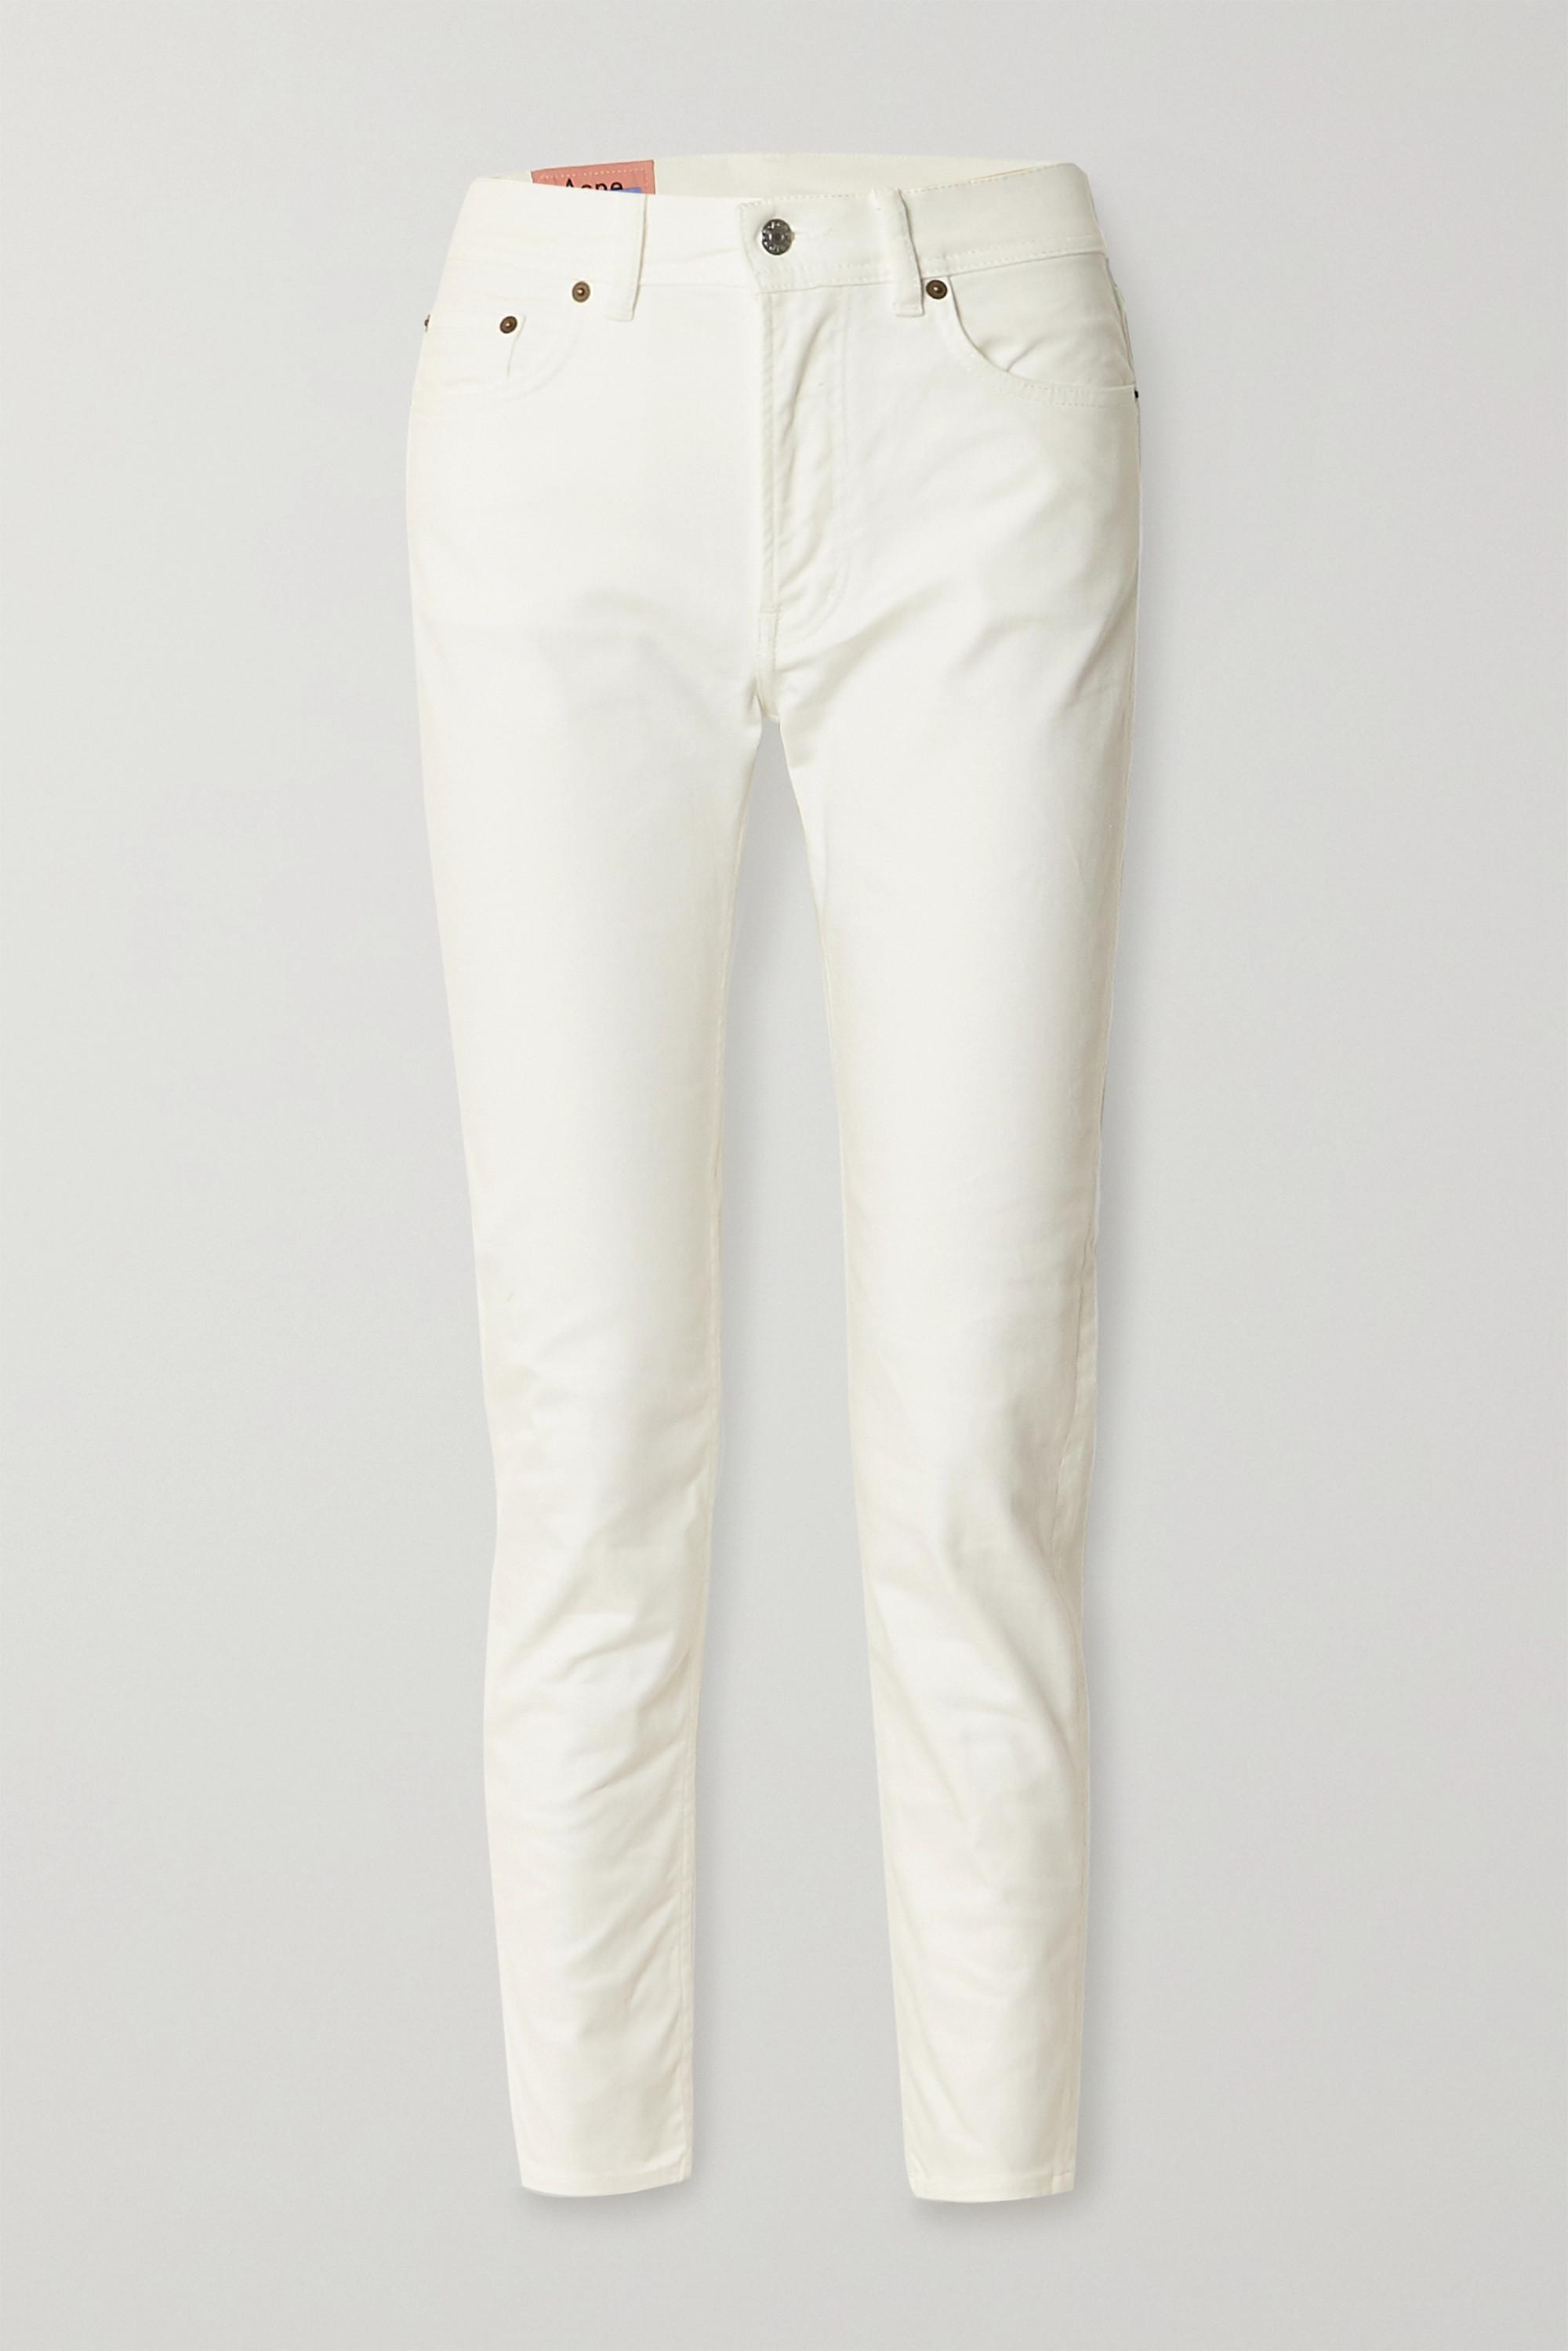 Acne Studios 高腰窄腿牛仔裤